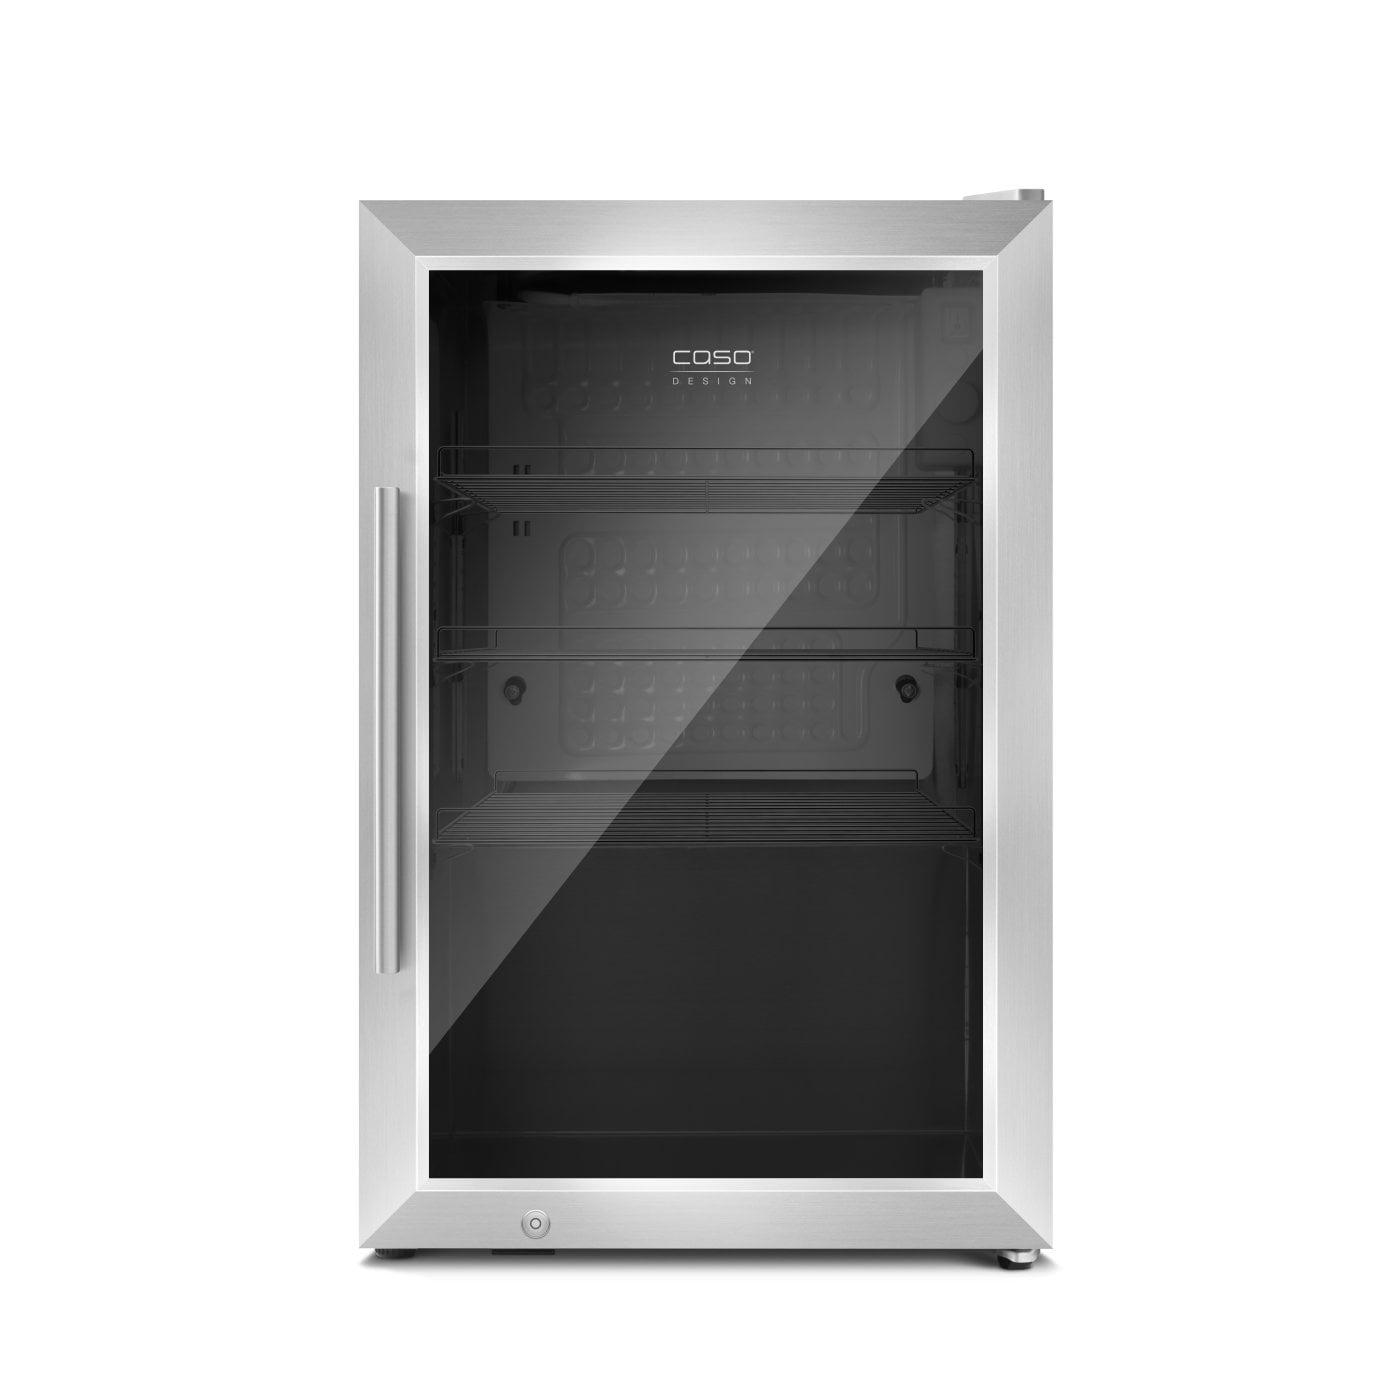 Getränkekühlschrank CASO Barbecue Cooler | CASO Design Onlineshop